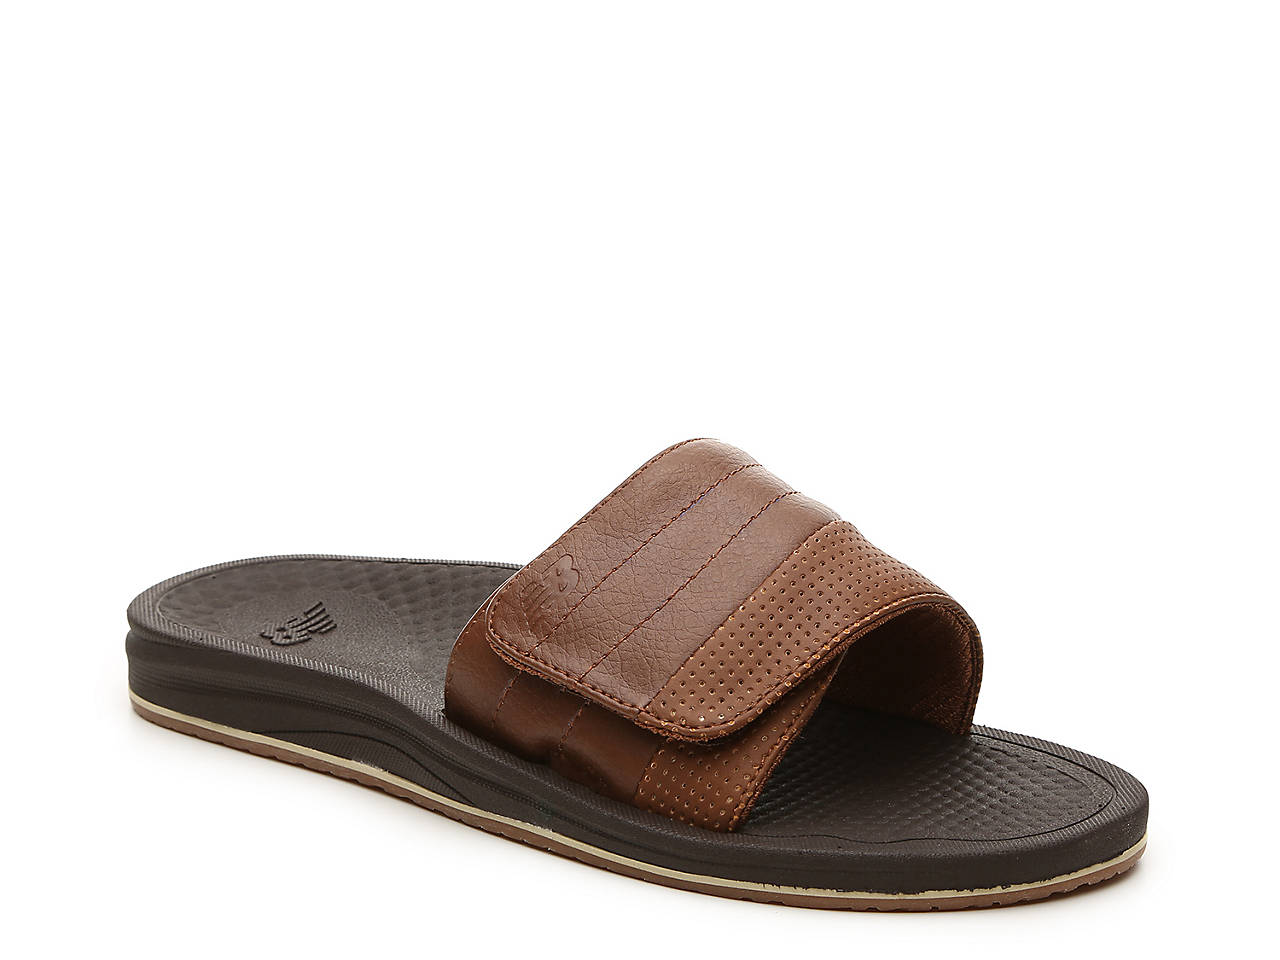 bd856369805 New Balance Recharge Slide Sandal Men s Shoes